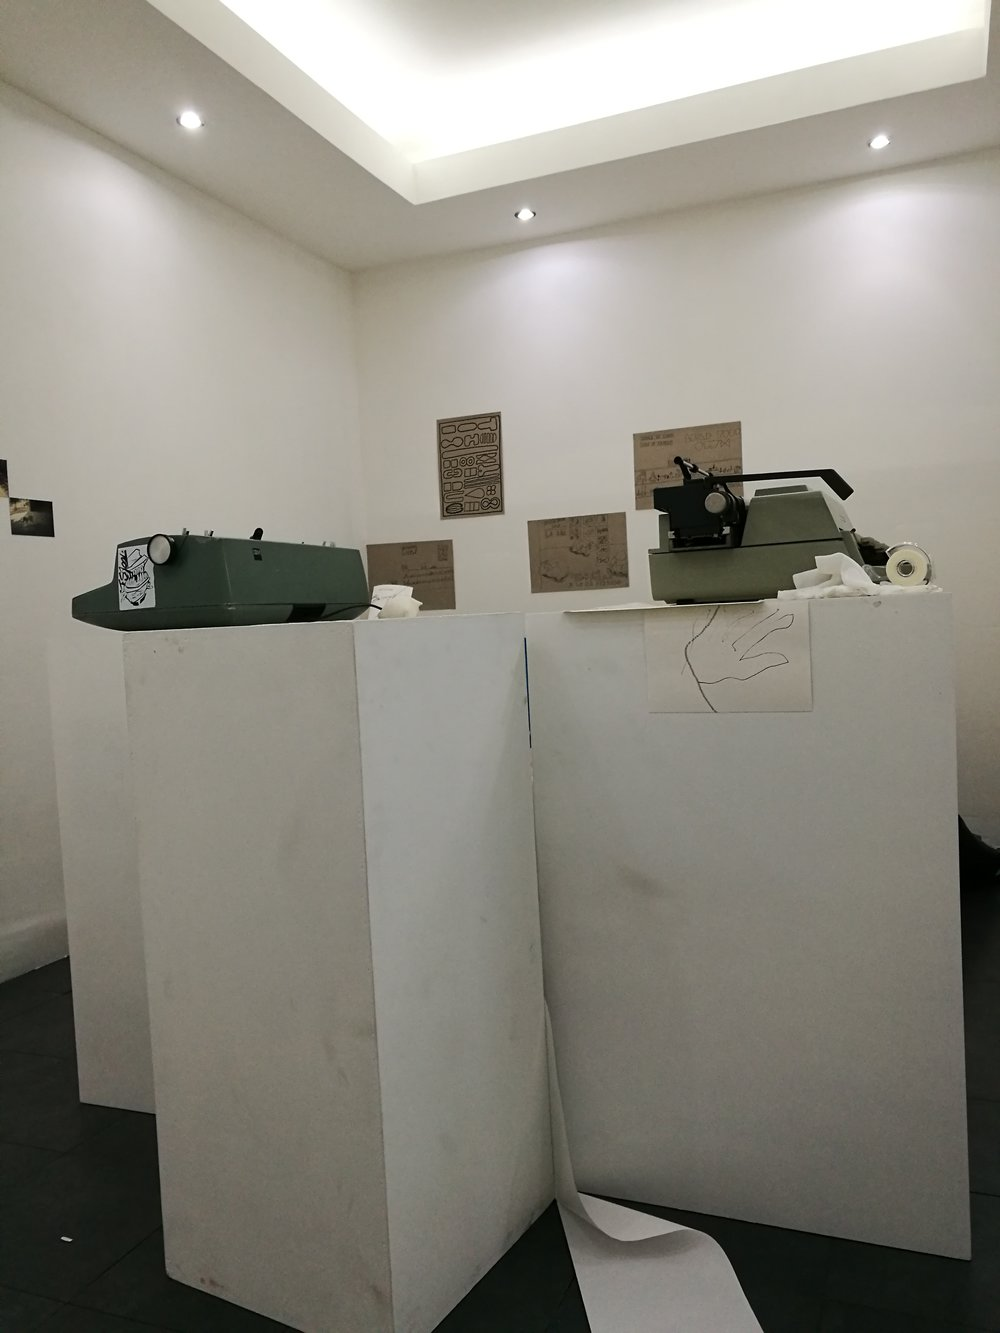 camila fernandez - project room 33.jpg